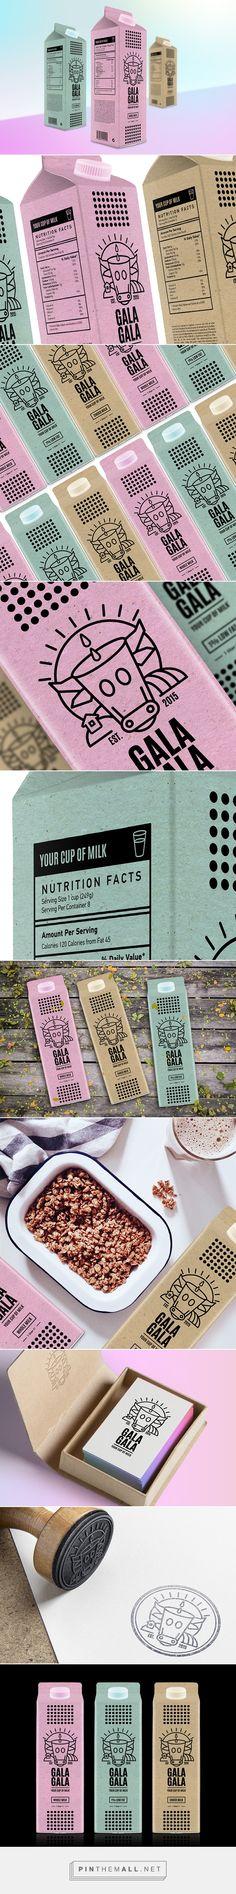 milk company | Gala Gala PD